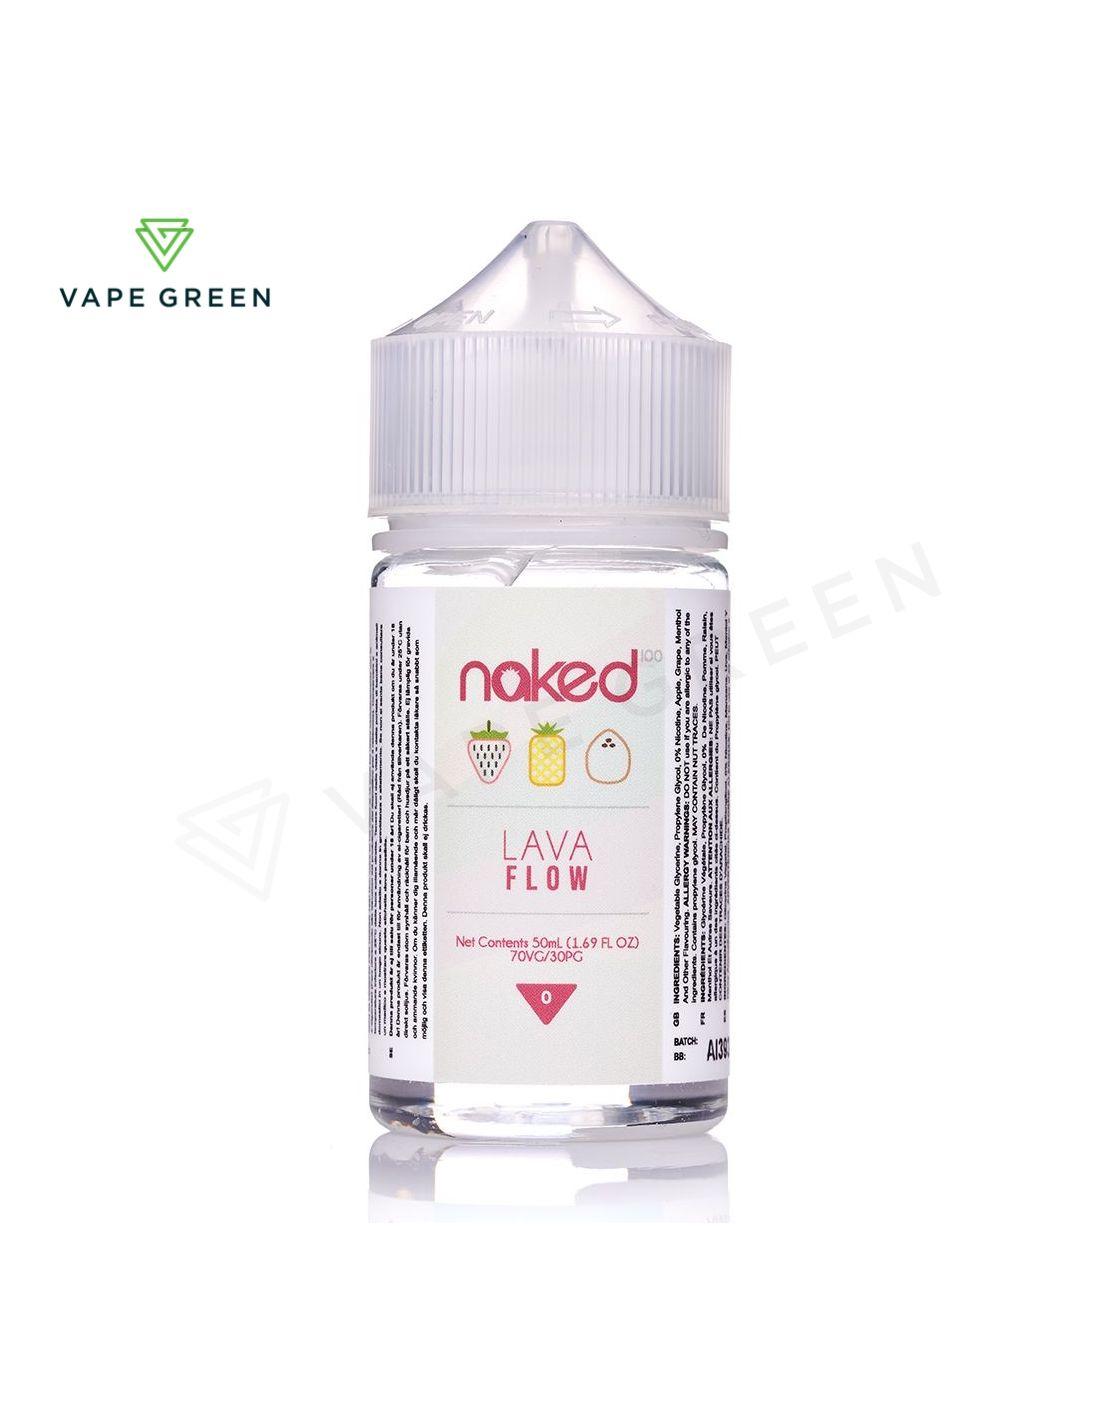 Naked 100 Lava Flow E-juice 60ml | Vapesourcing